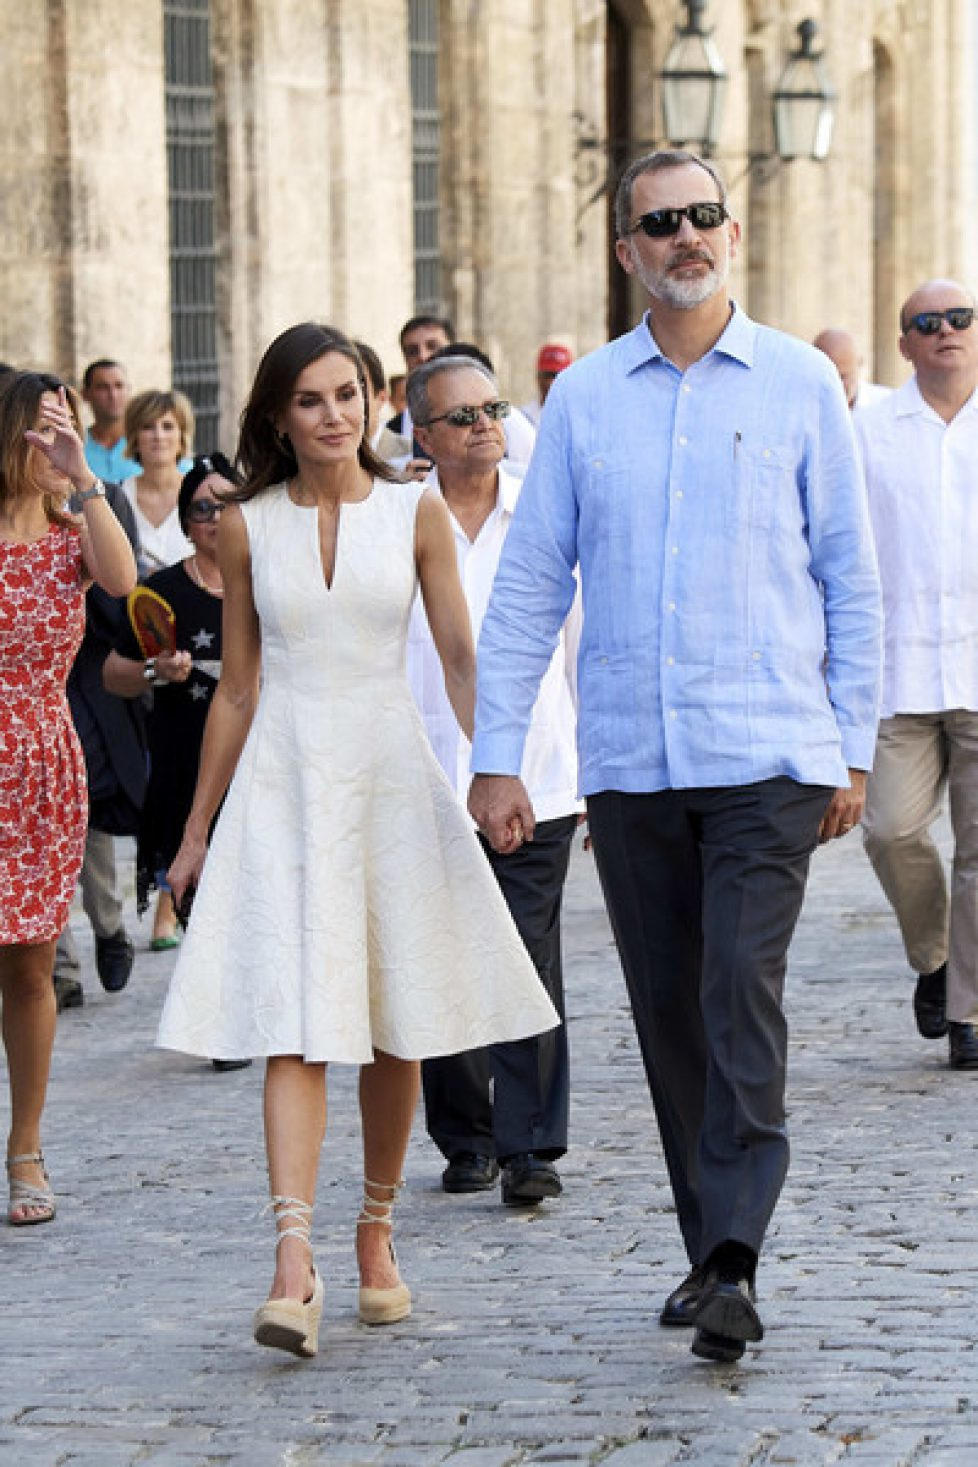 Day+1+Spanish+Royals+Visit+Cuba+nqr_P-icwozl